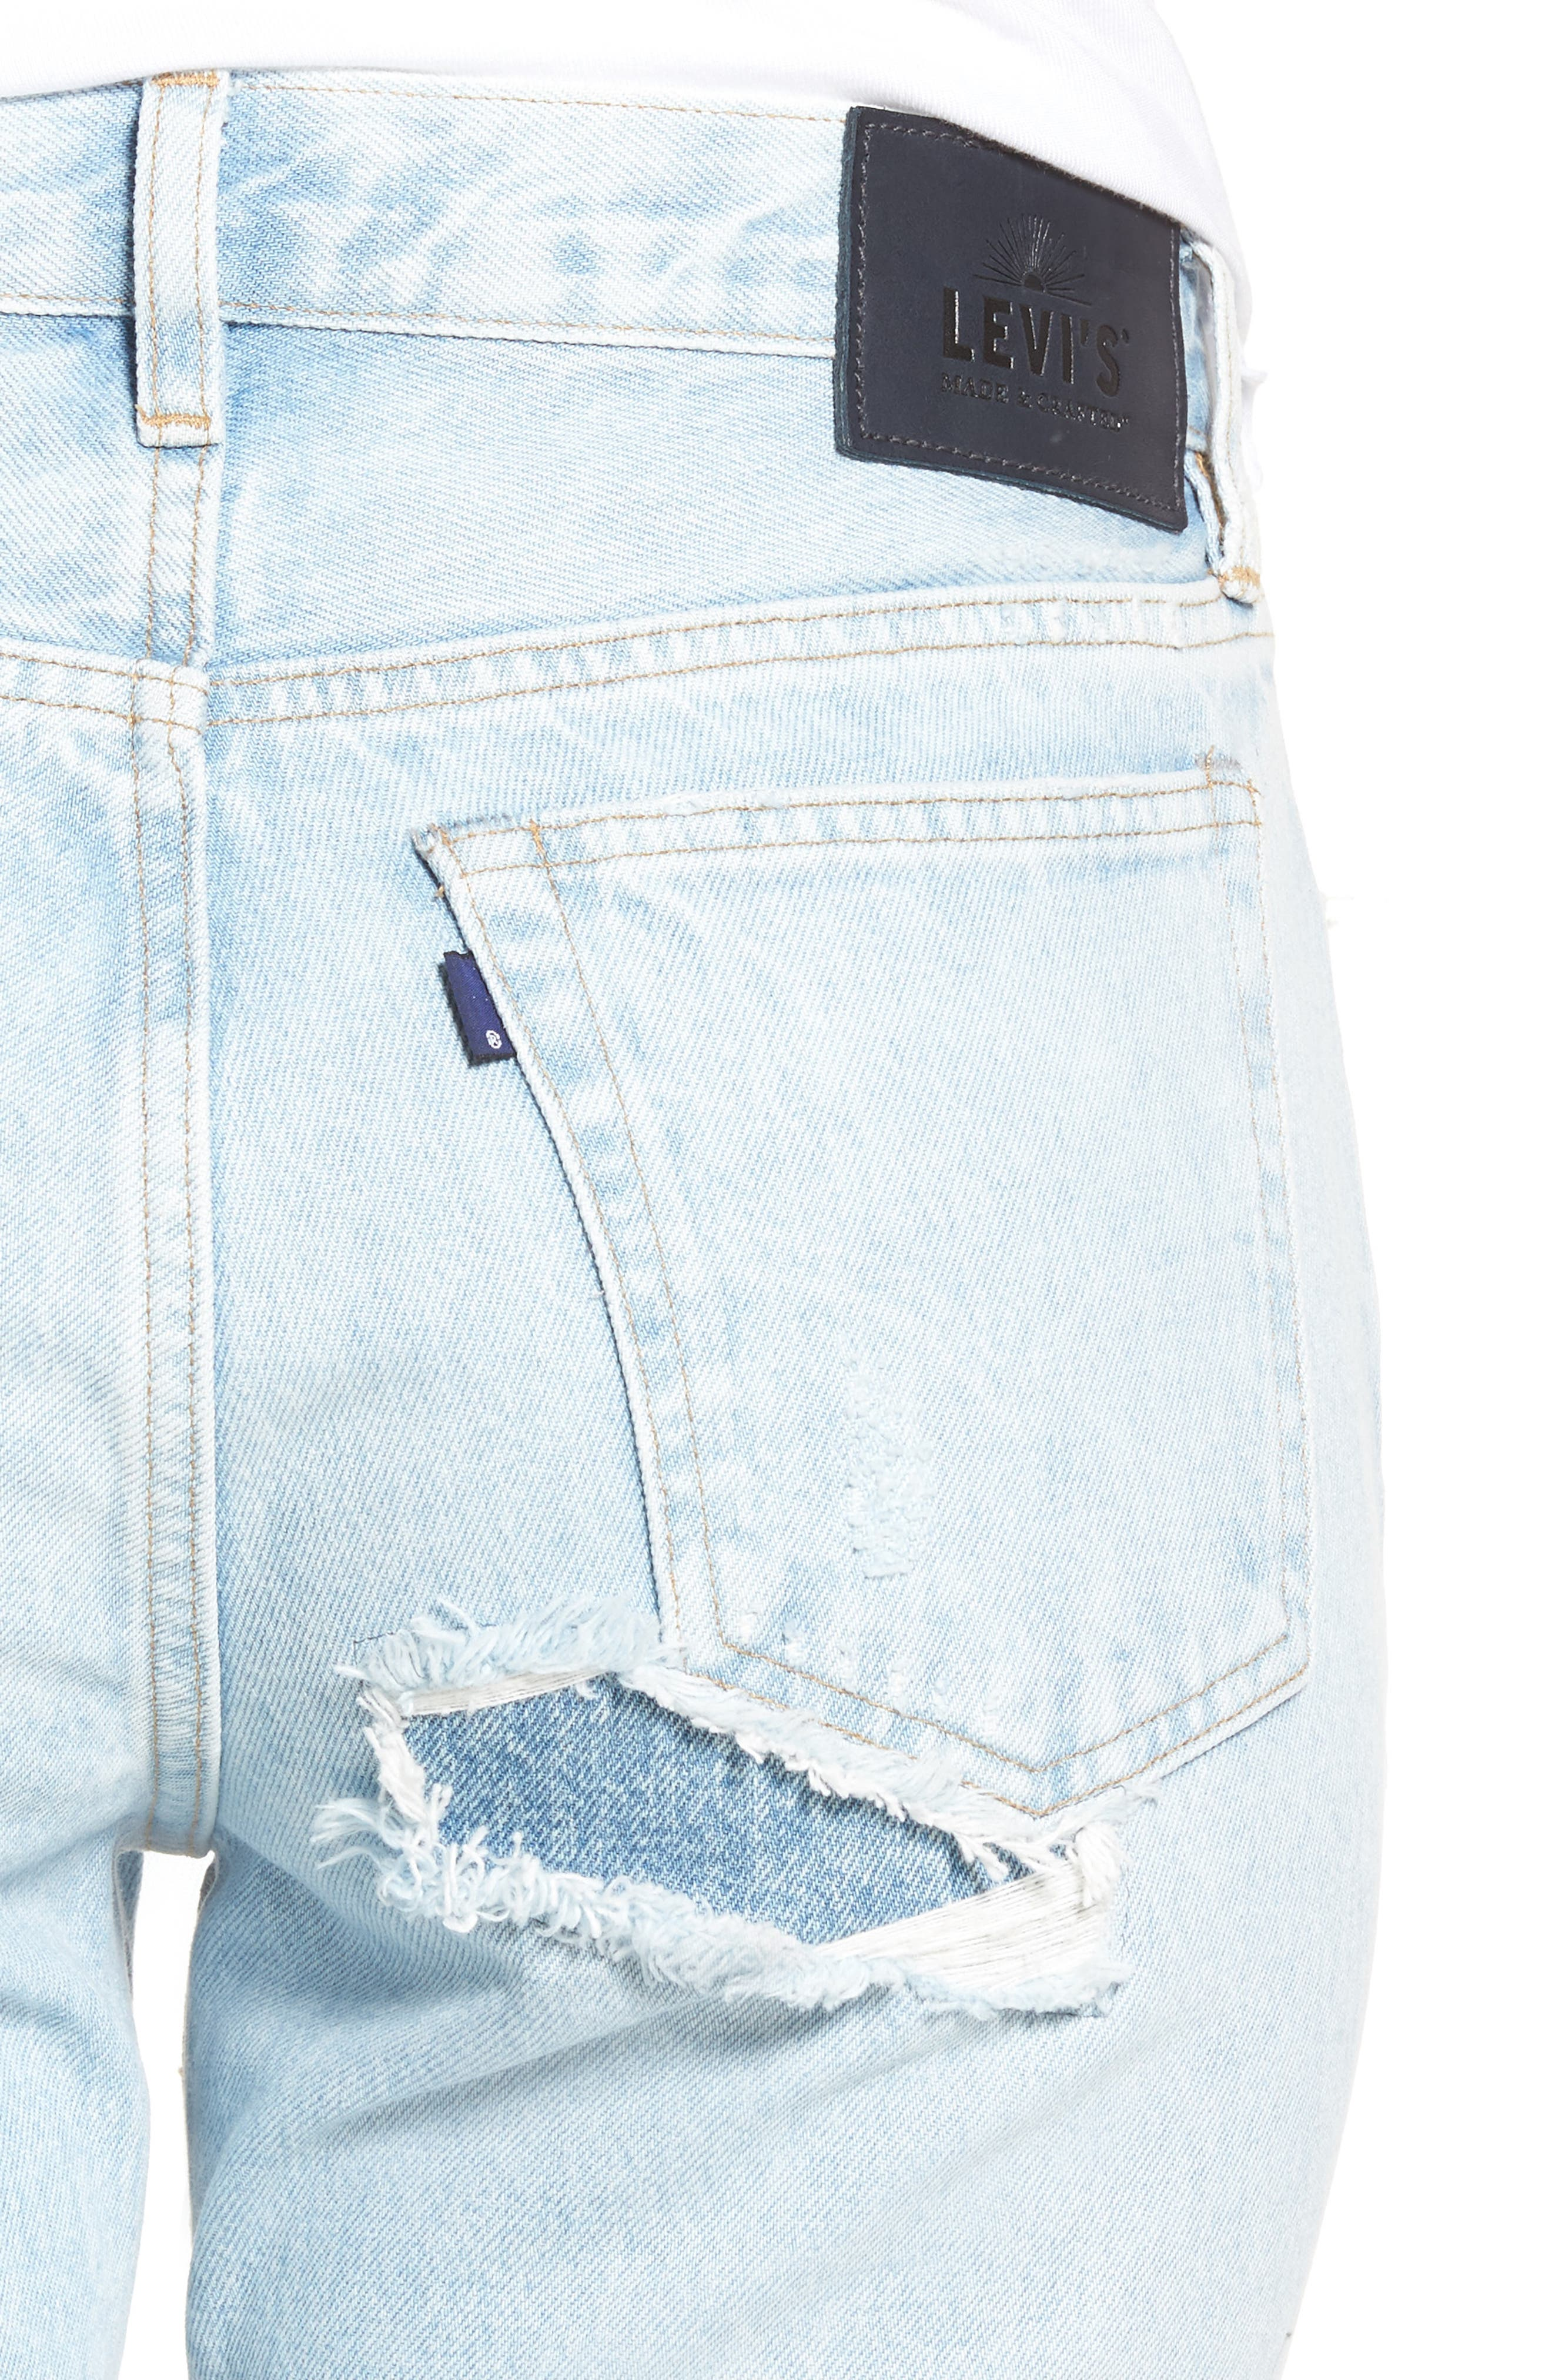 Twig II High Waist Ankle Slim Jeans,                             Alternate thumbnail 6, color,                             Pipeline Blue